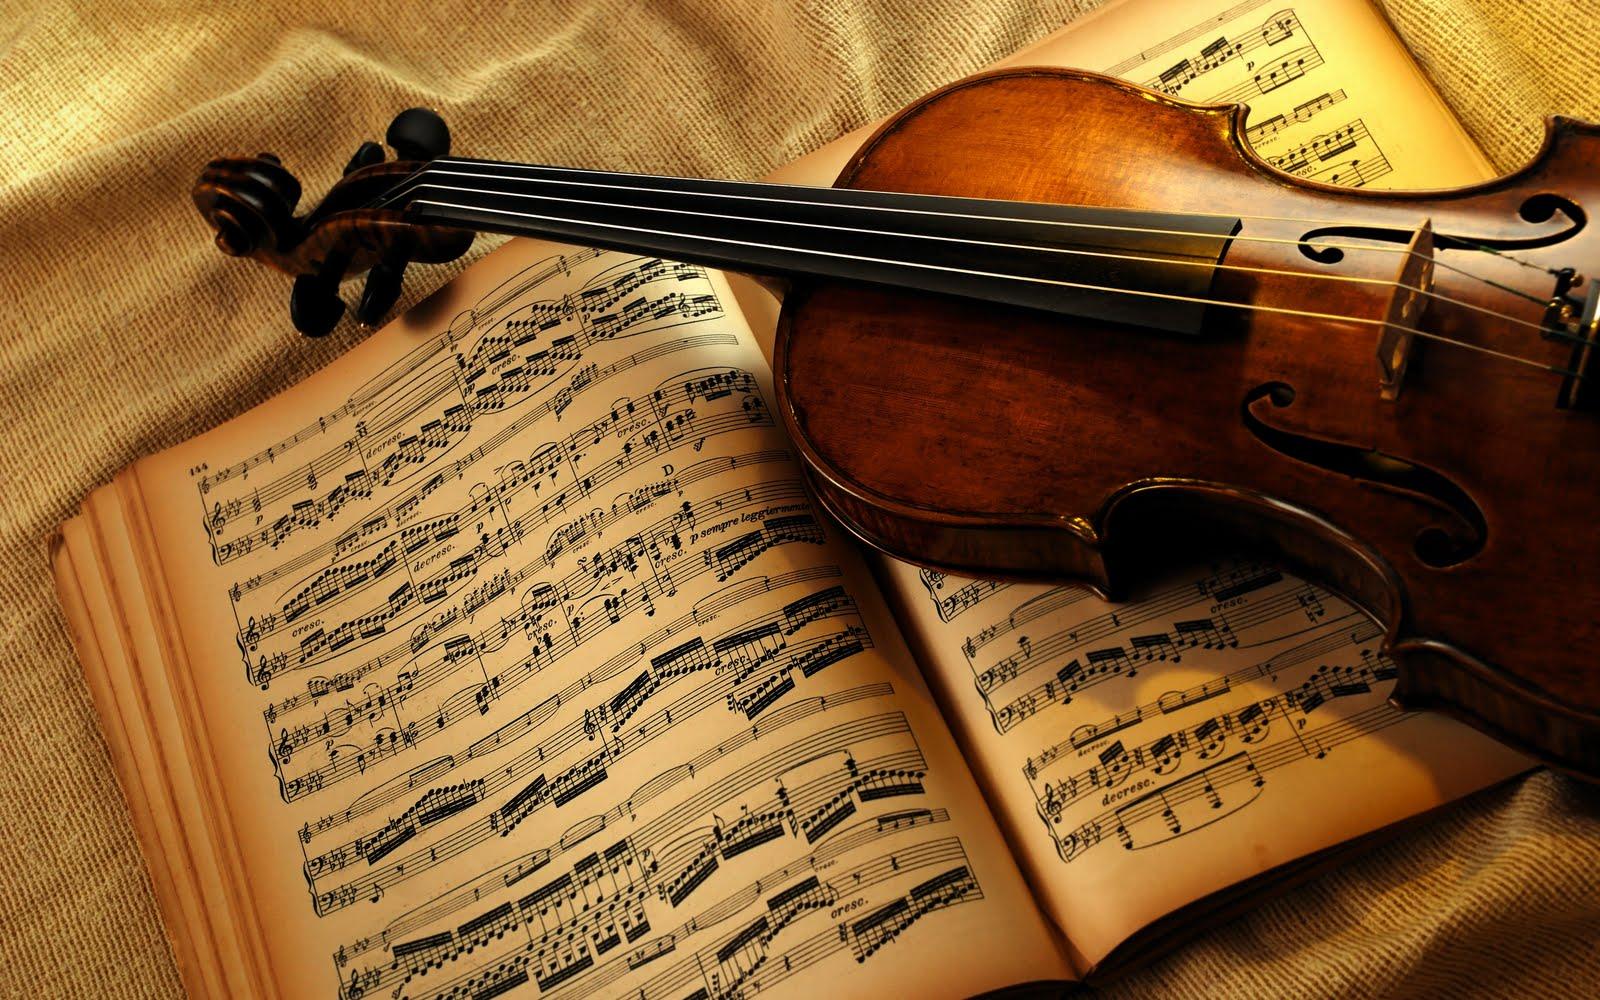 Classical musikinstrumente - 26410